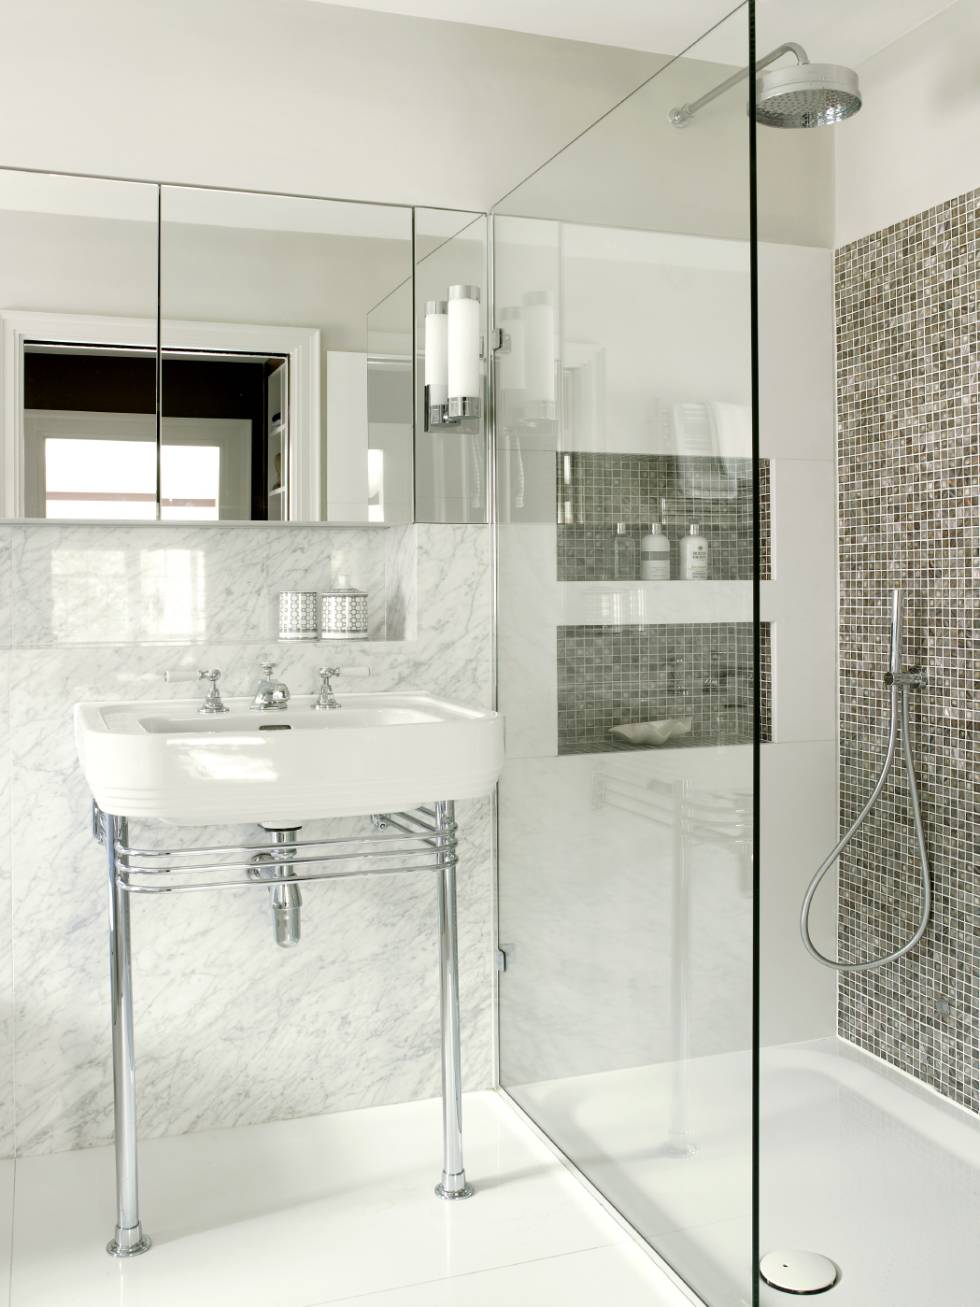 6 Model Kaca Kamar Mandi Untuk Kamar Mandi Yang Lebih Bersih Harga partisi kaca kamar mandi